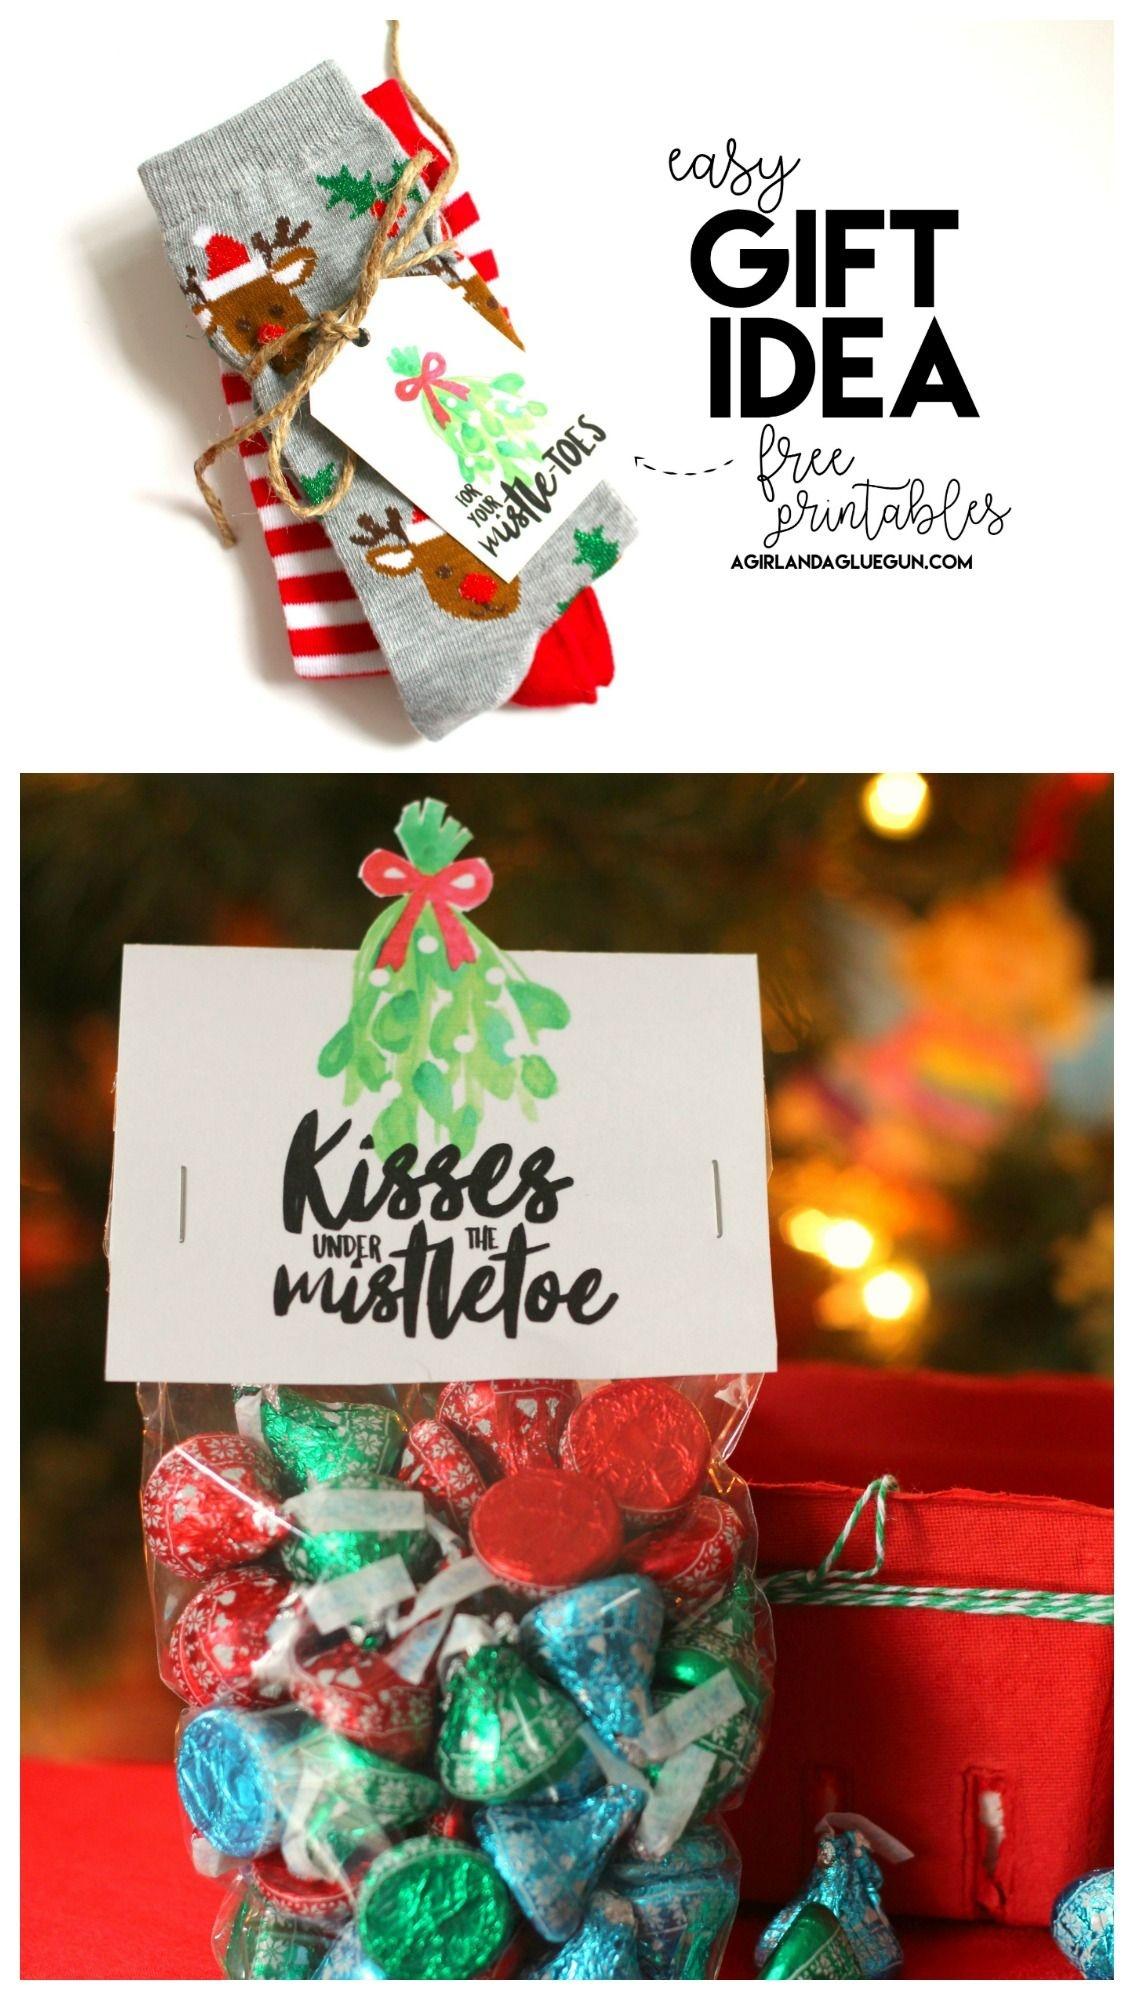 Mistletoe Gift Ideas-Free Printables | Christmas Ideas & Recipes - Free Printable Mistletoe Tags